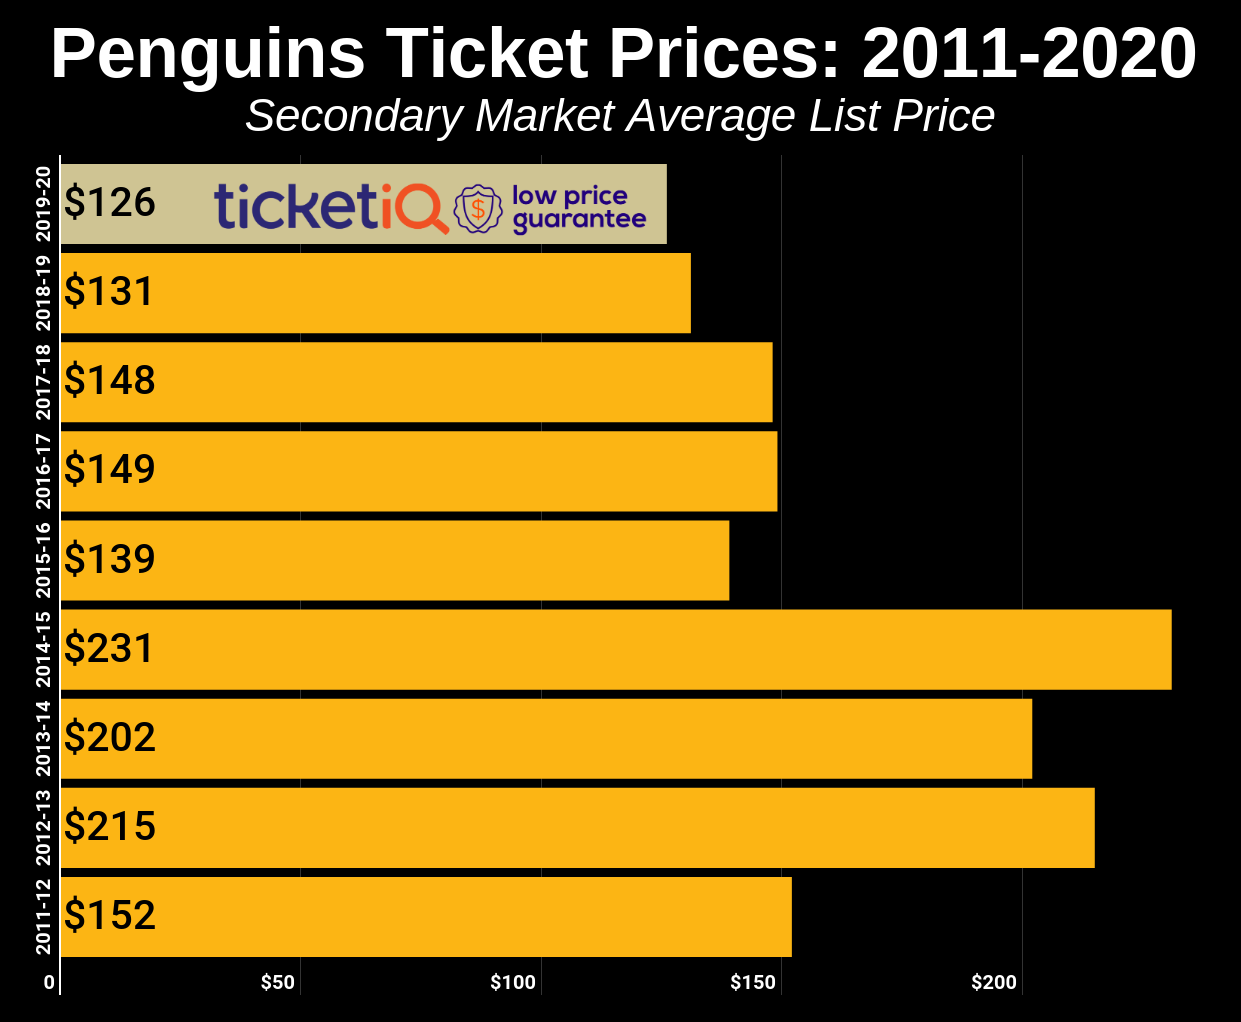 penguins-2011-2020